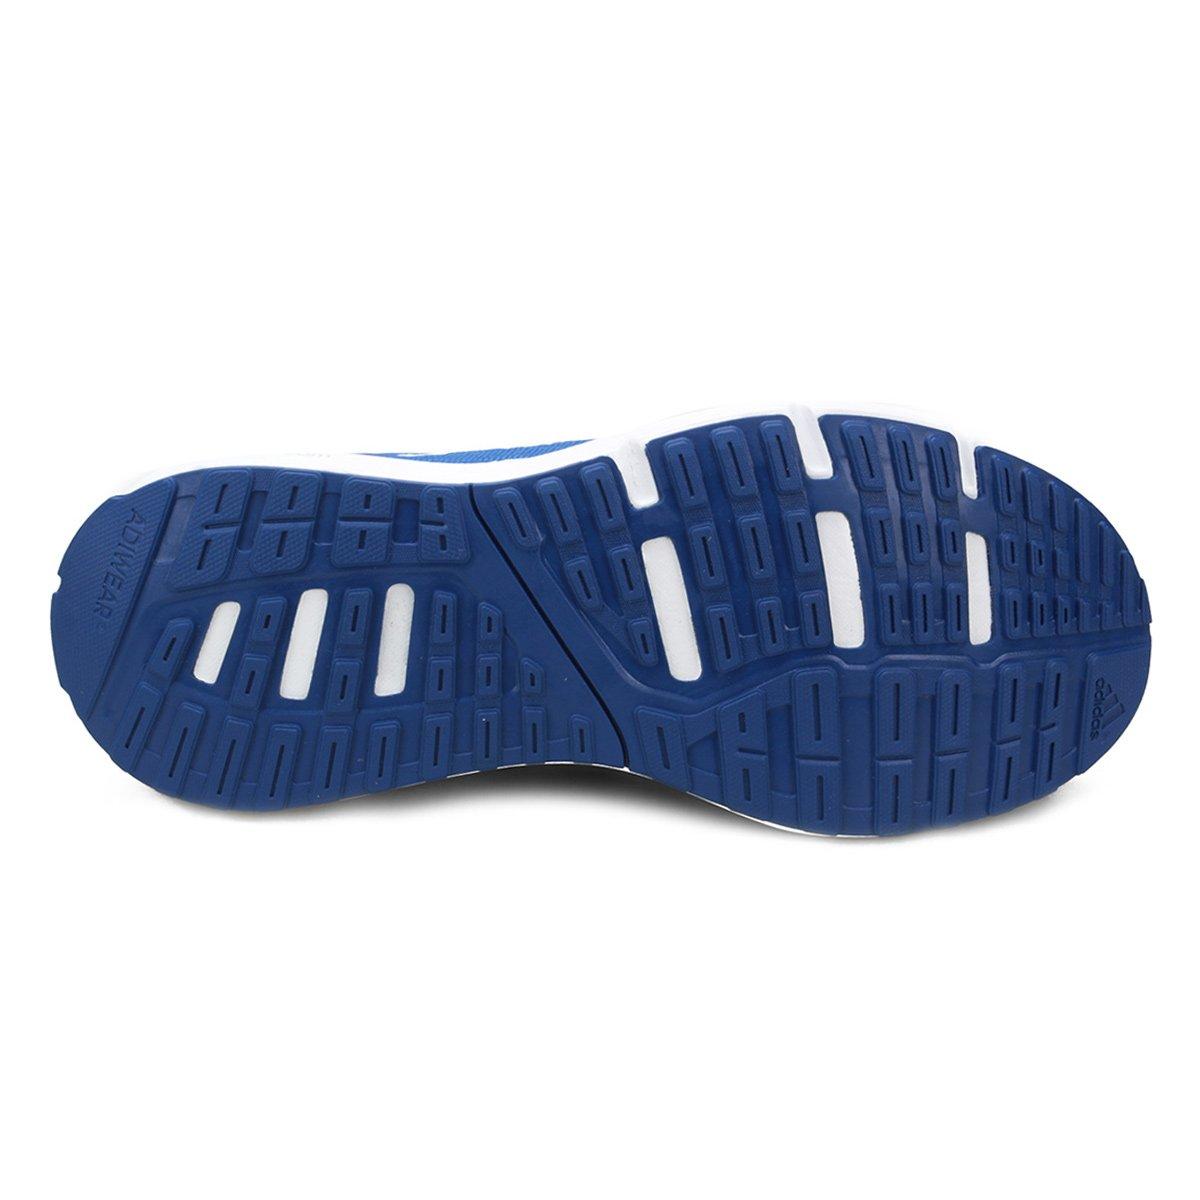 54ffb37843 Tênis Adidas Cosmic 2 Masculino - Branco e Azul Royal - Compre Agora ...